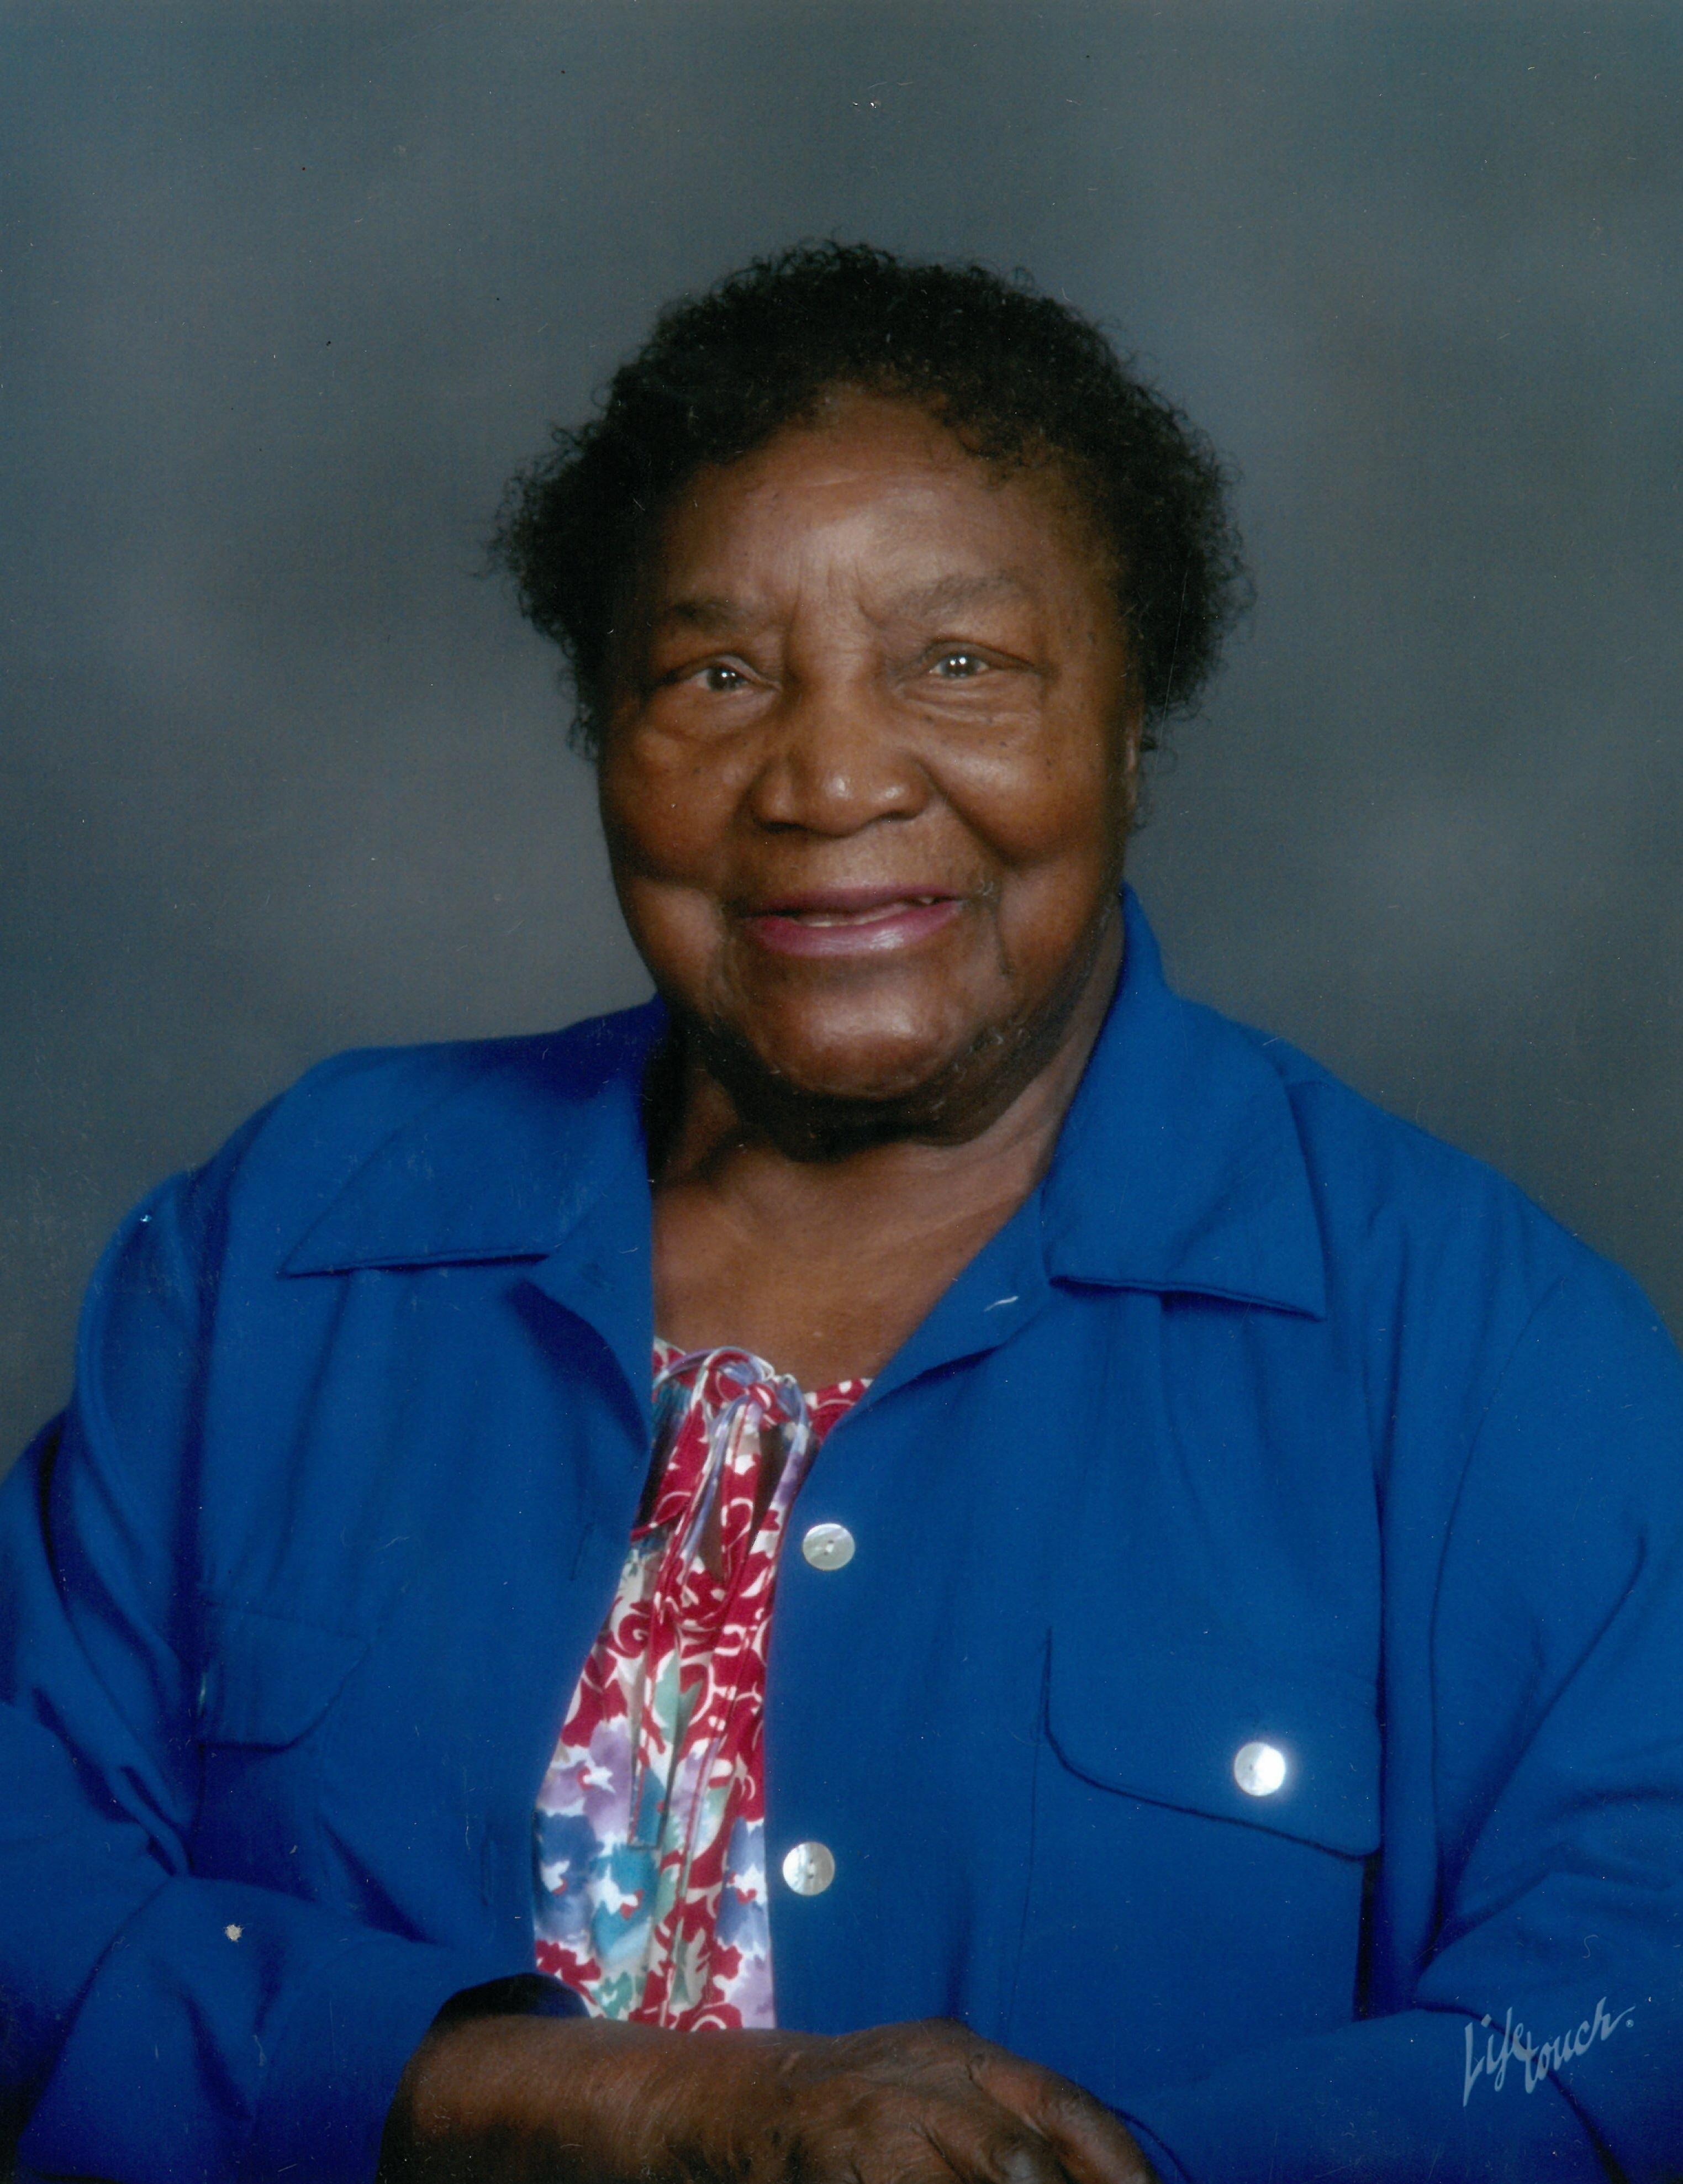 6daf65b4a86e4 ROSEMARY KNAPP Obituary - Visitation & Funeral Information